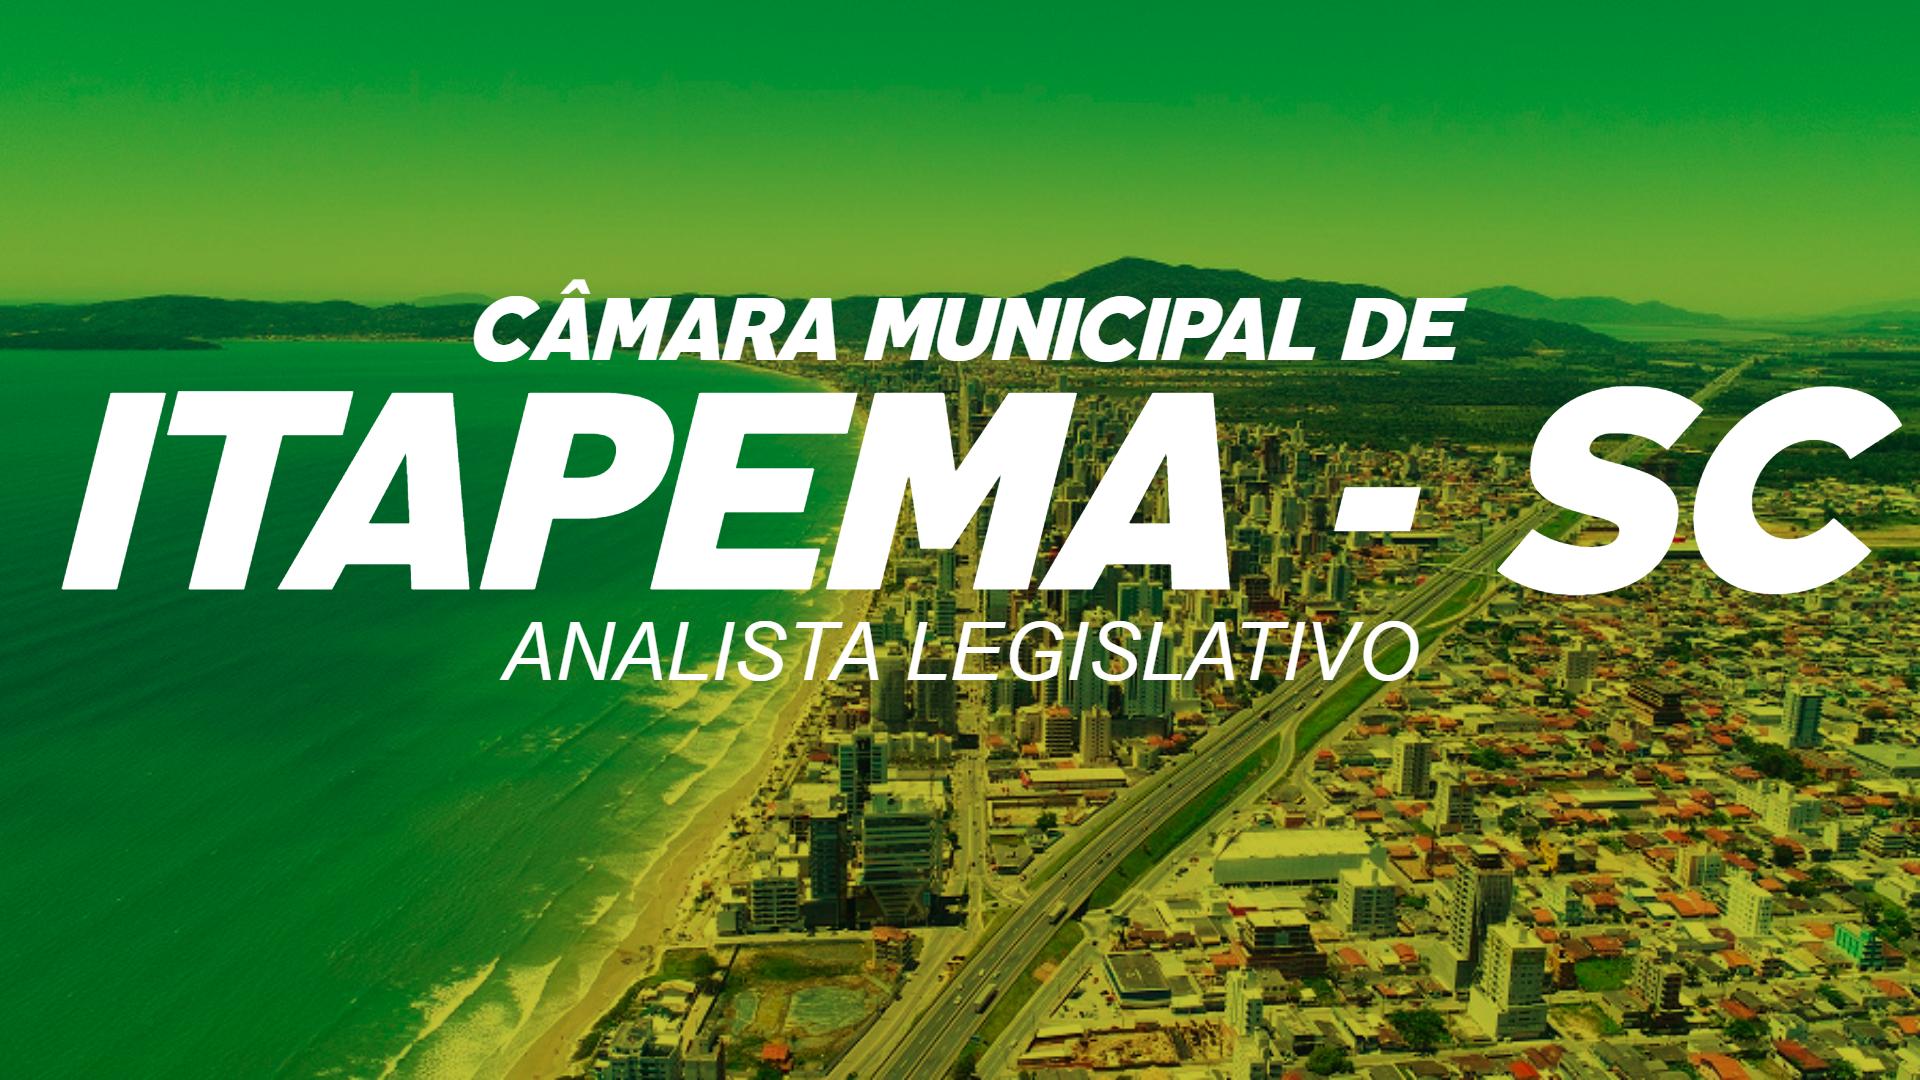 Câmara Municipal de Itapema - SC - Analista Legislativo